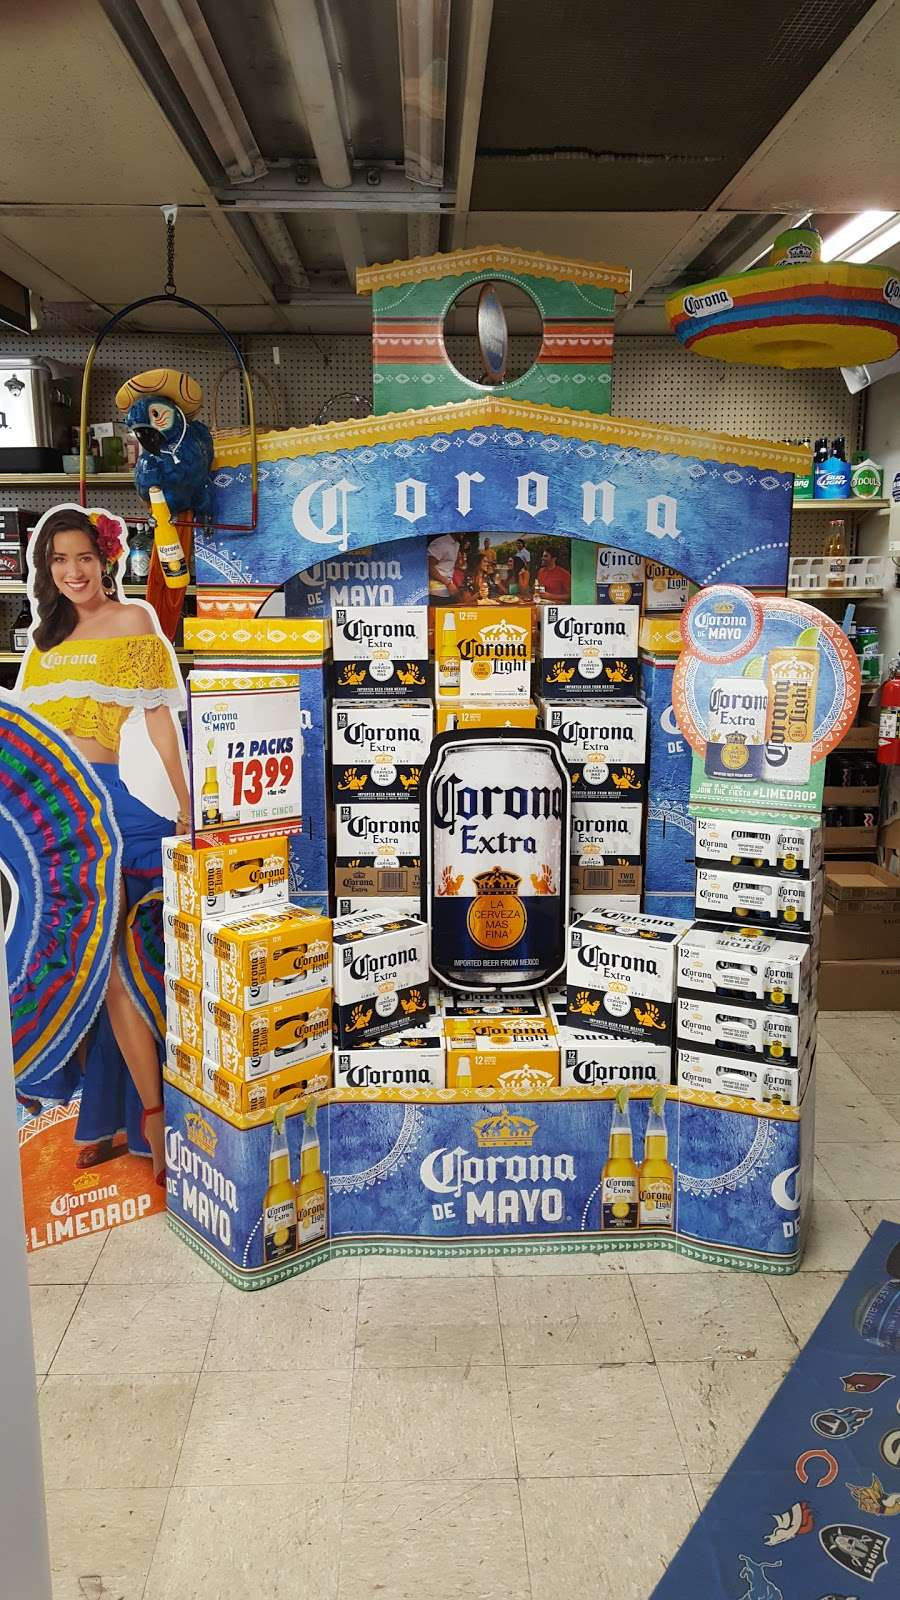 Turf Liquor - store  | Photo 1 of 2 | Address: Whittier, CA 90605, USA